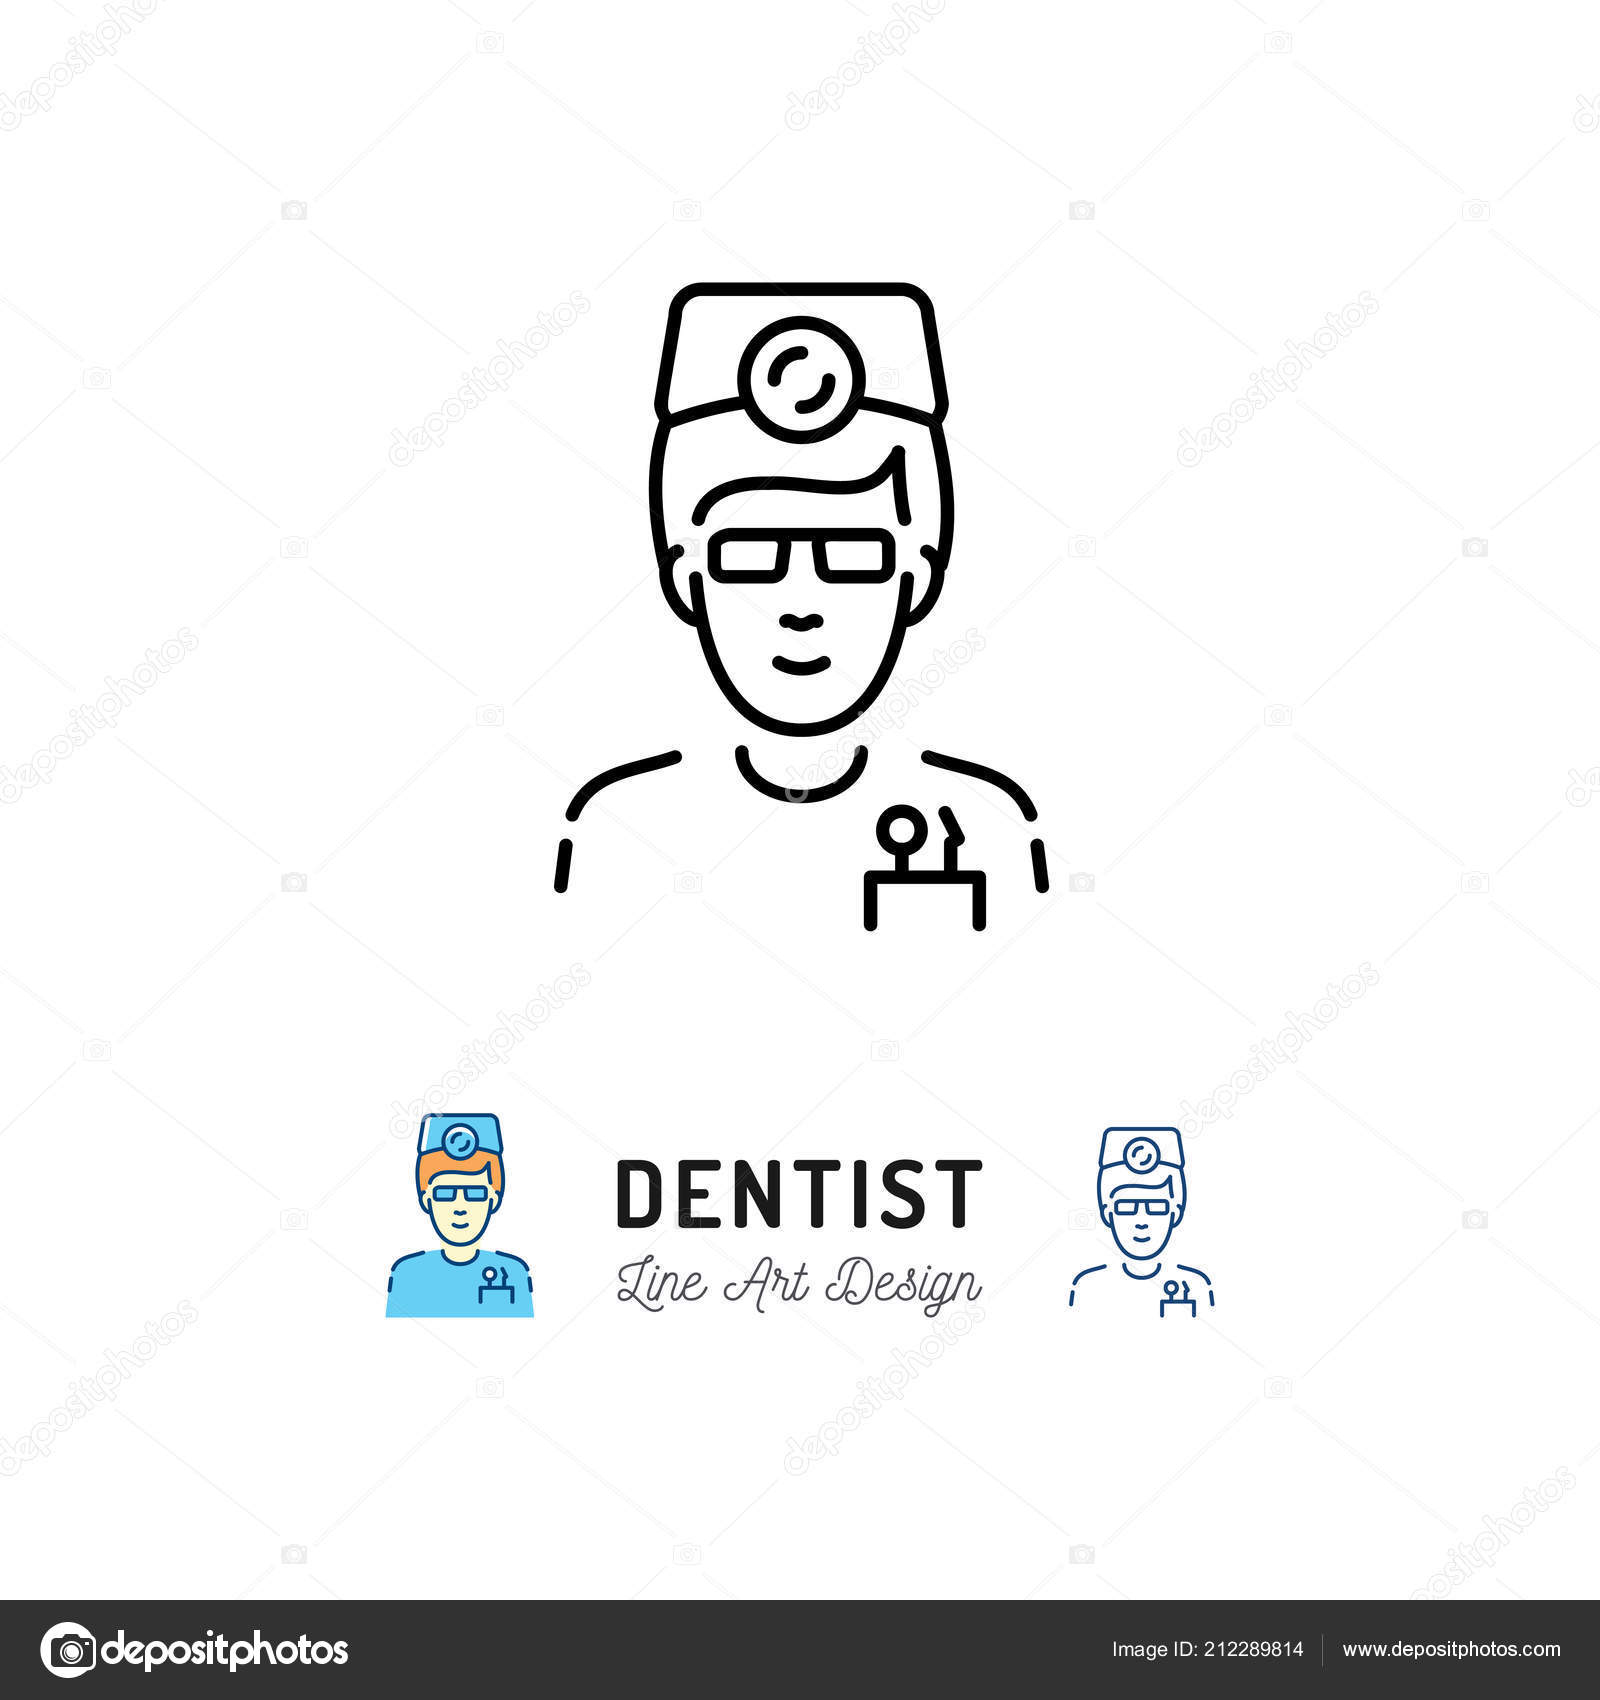 Dentist Icon Dental Surgeon Doctor Therapist Logo Dental Care And Stomatology Thin Line Art Icons Vector Illustration Stock Vector C Decobrush 212289814